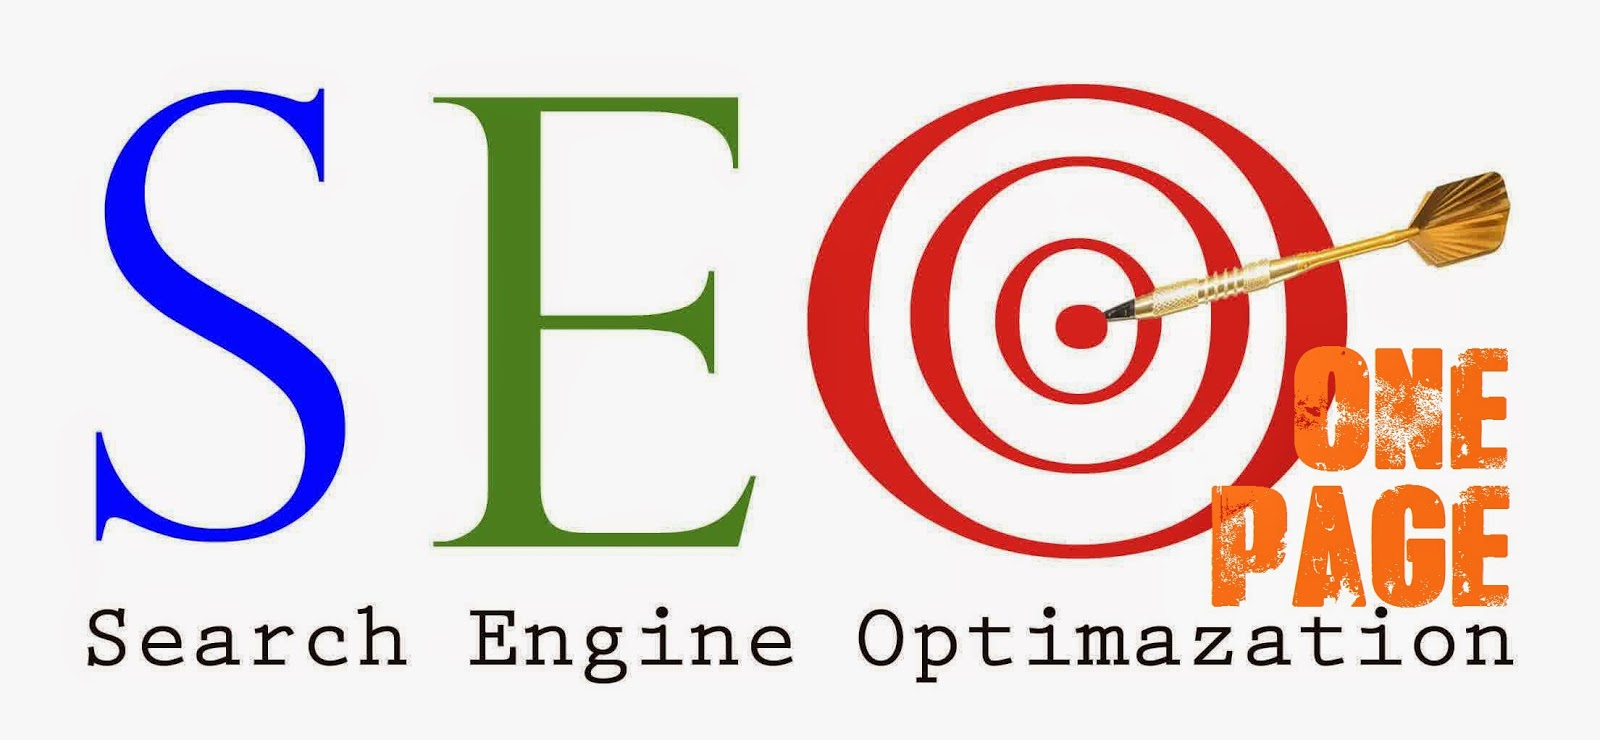 Cara Ampuh Optimisasi Onpage Pada Blog/Web